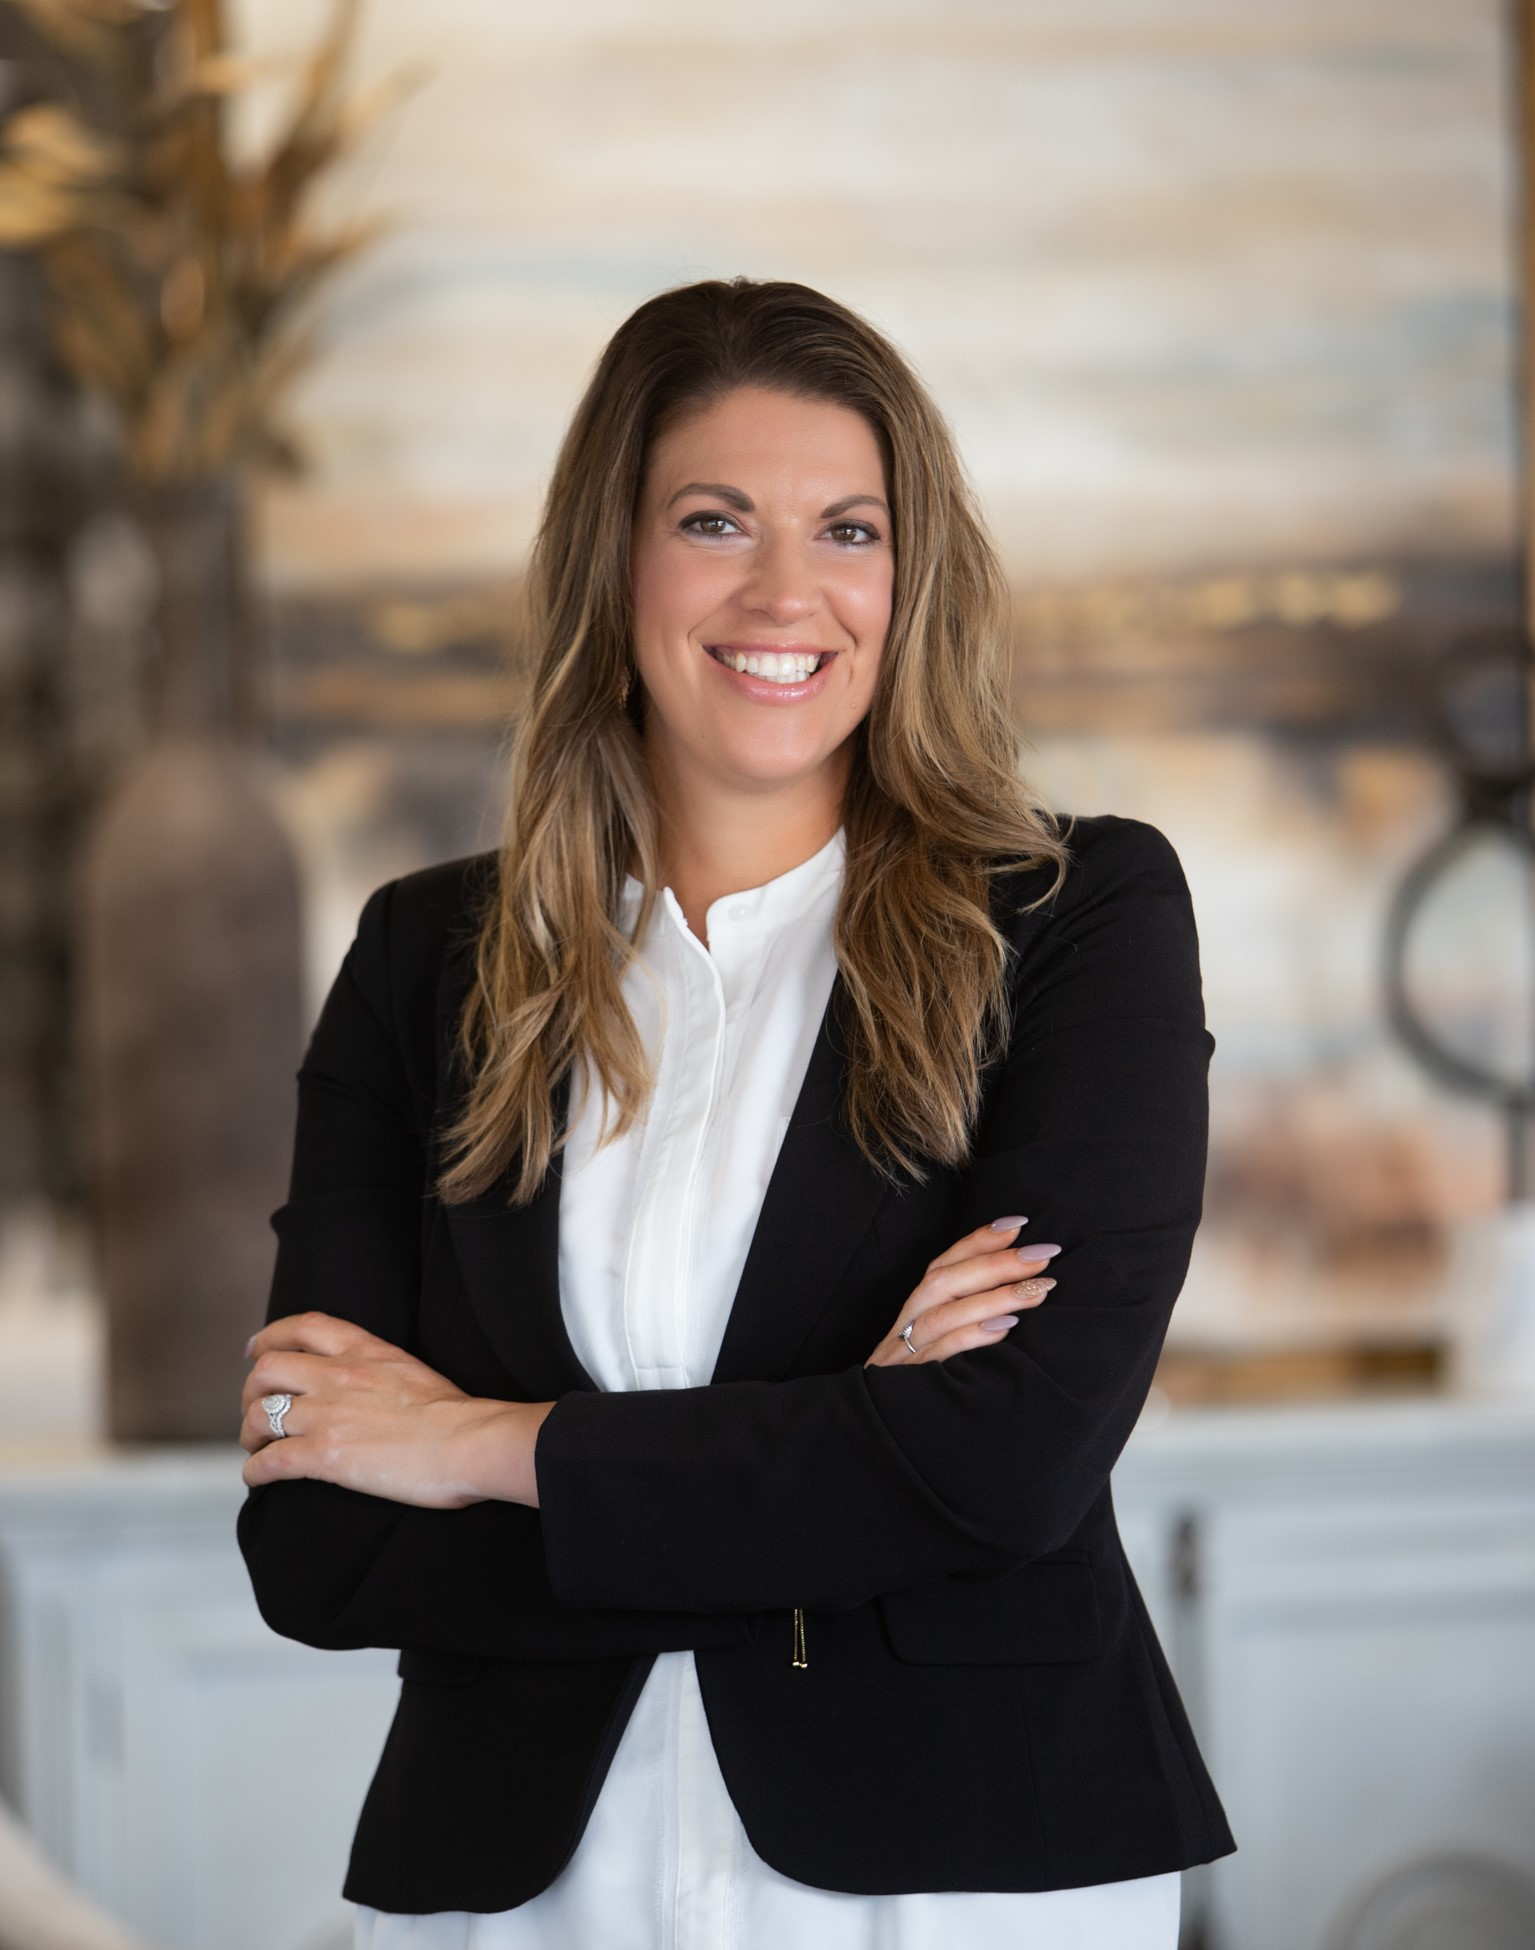 Shanna Real Estate agent Lincoln NE